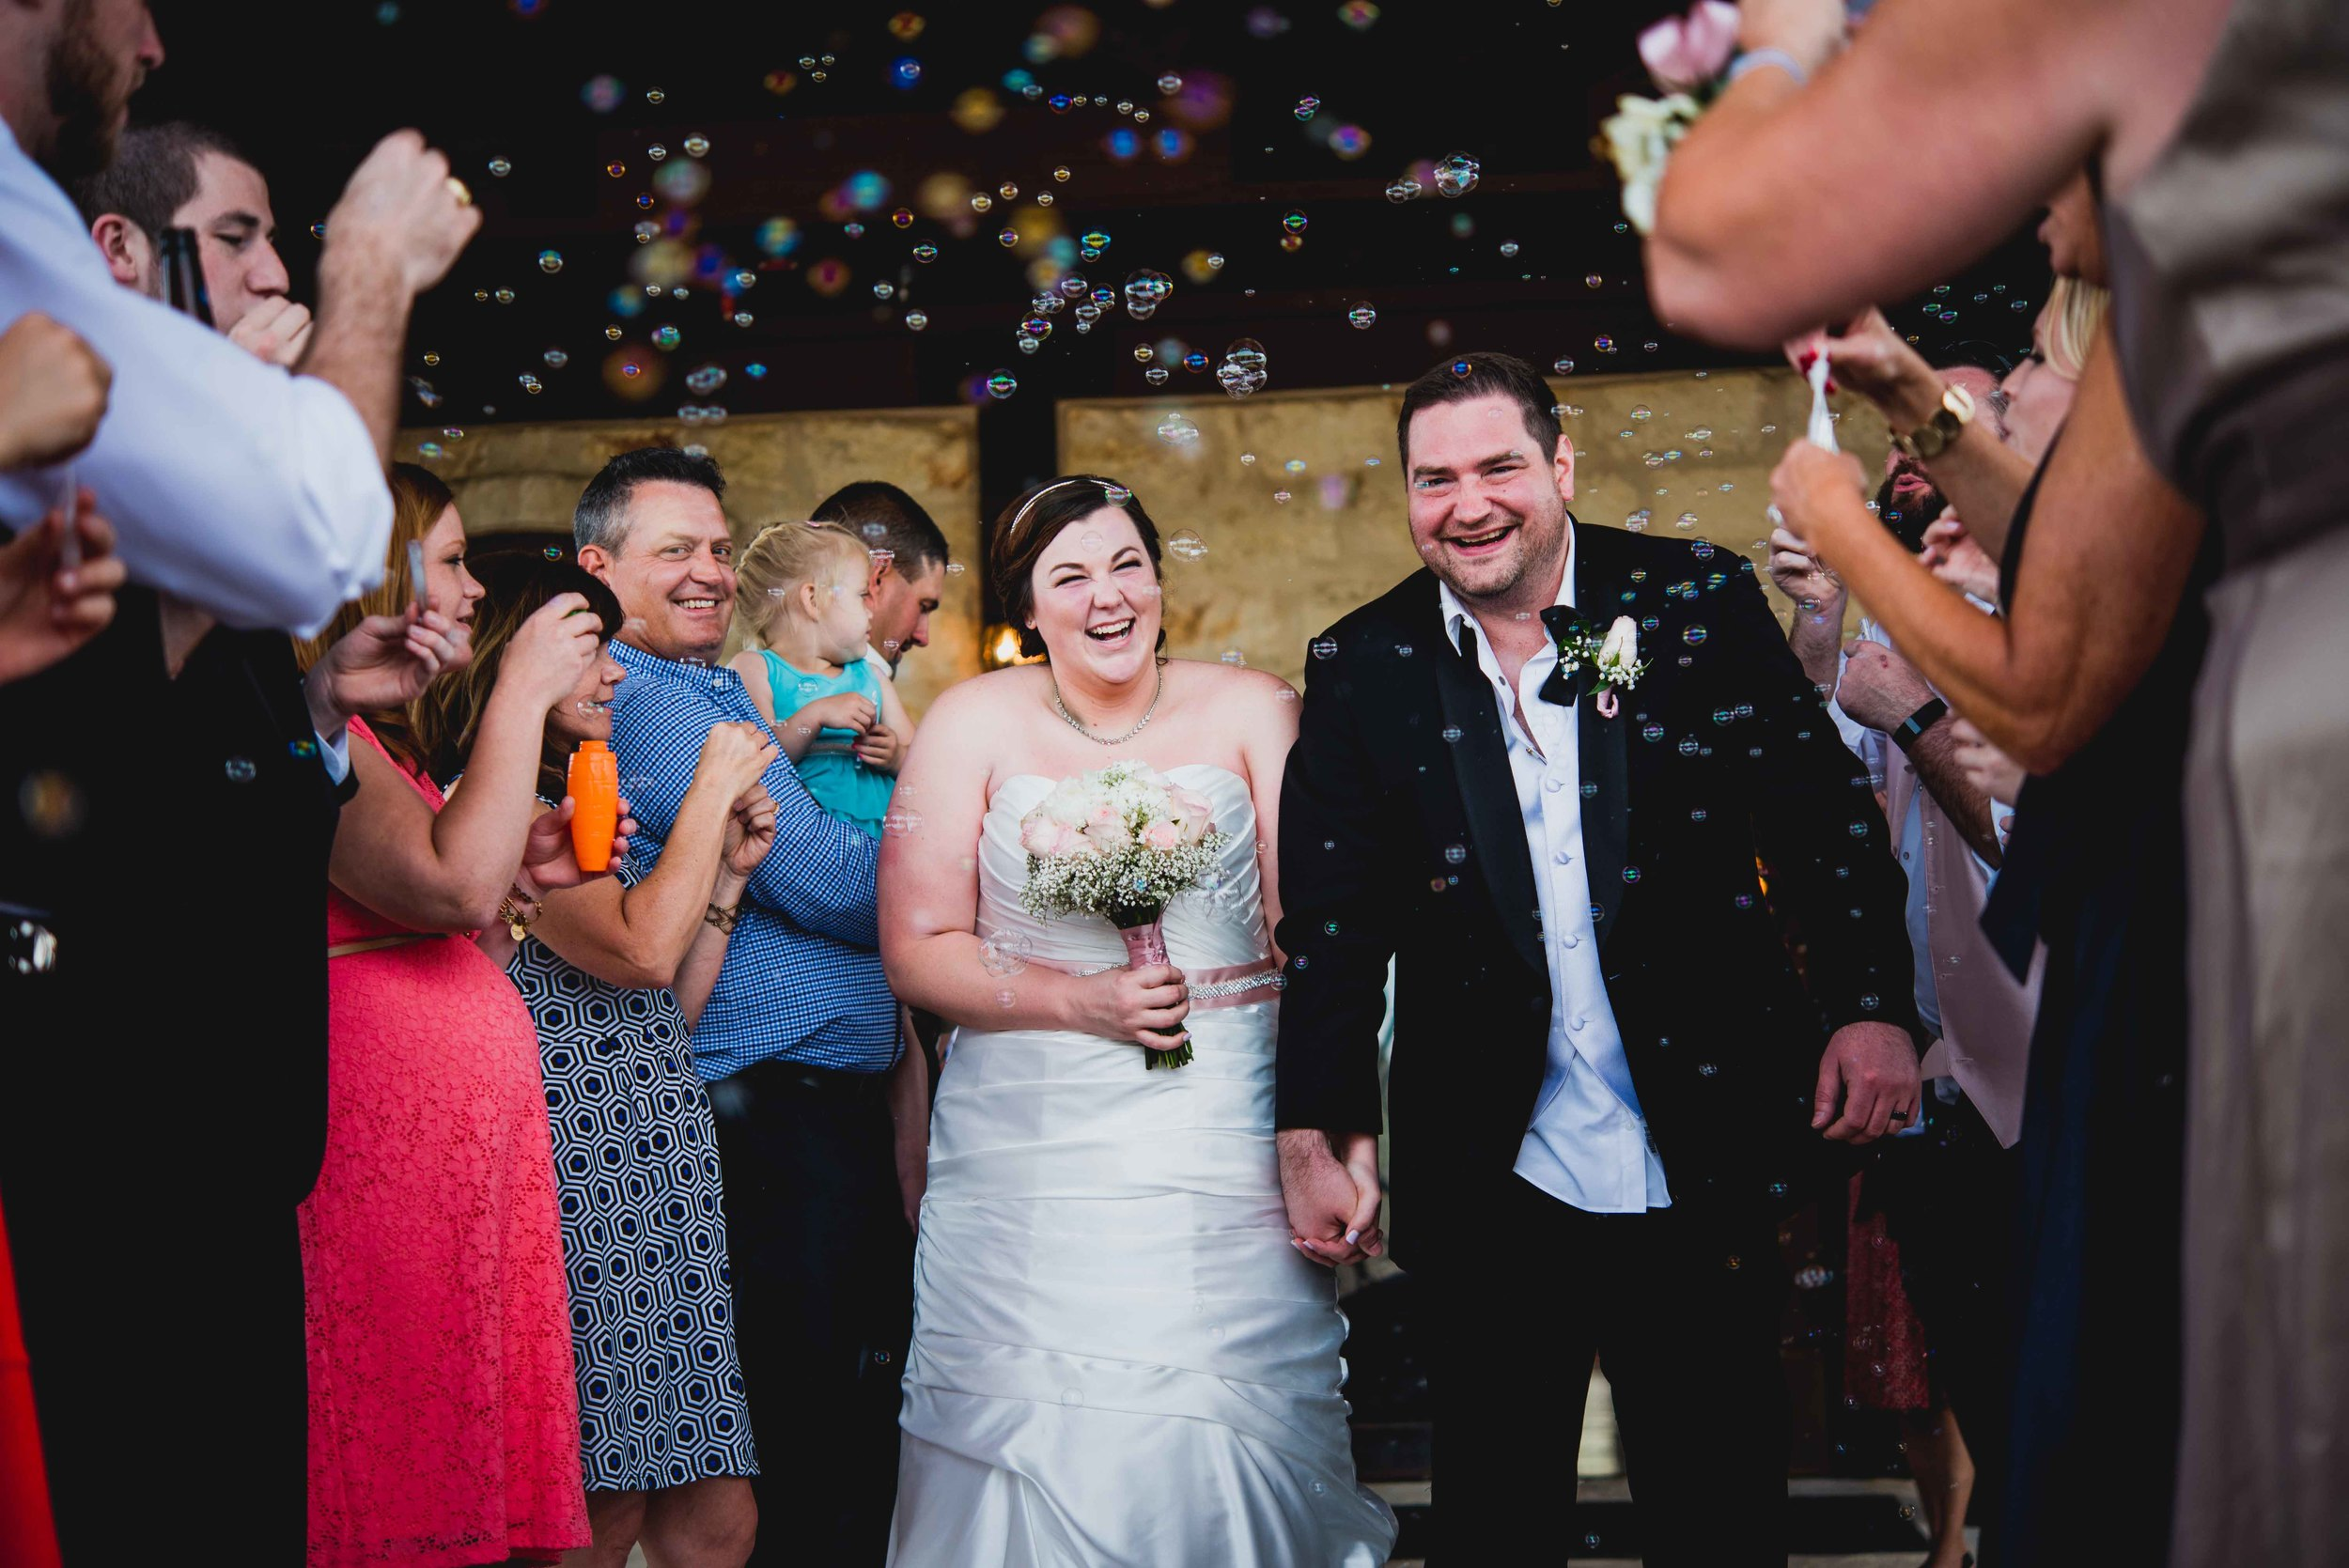 Dallas Wedding - Heritage Springs - Katie and Dustin - Bubble Exit